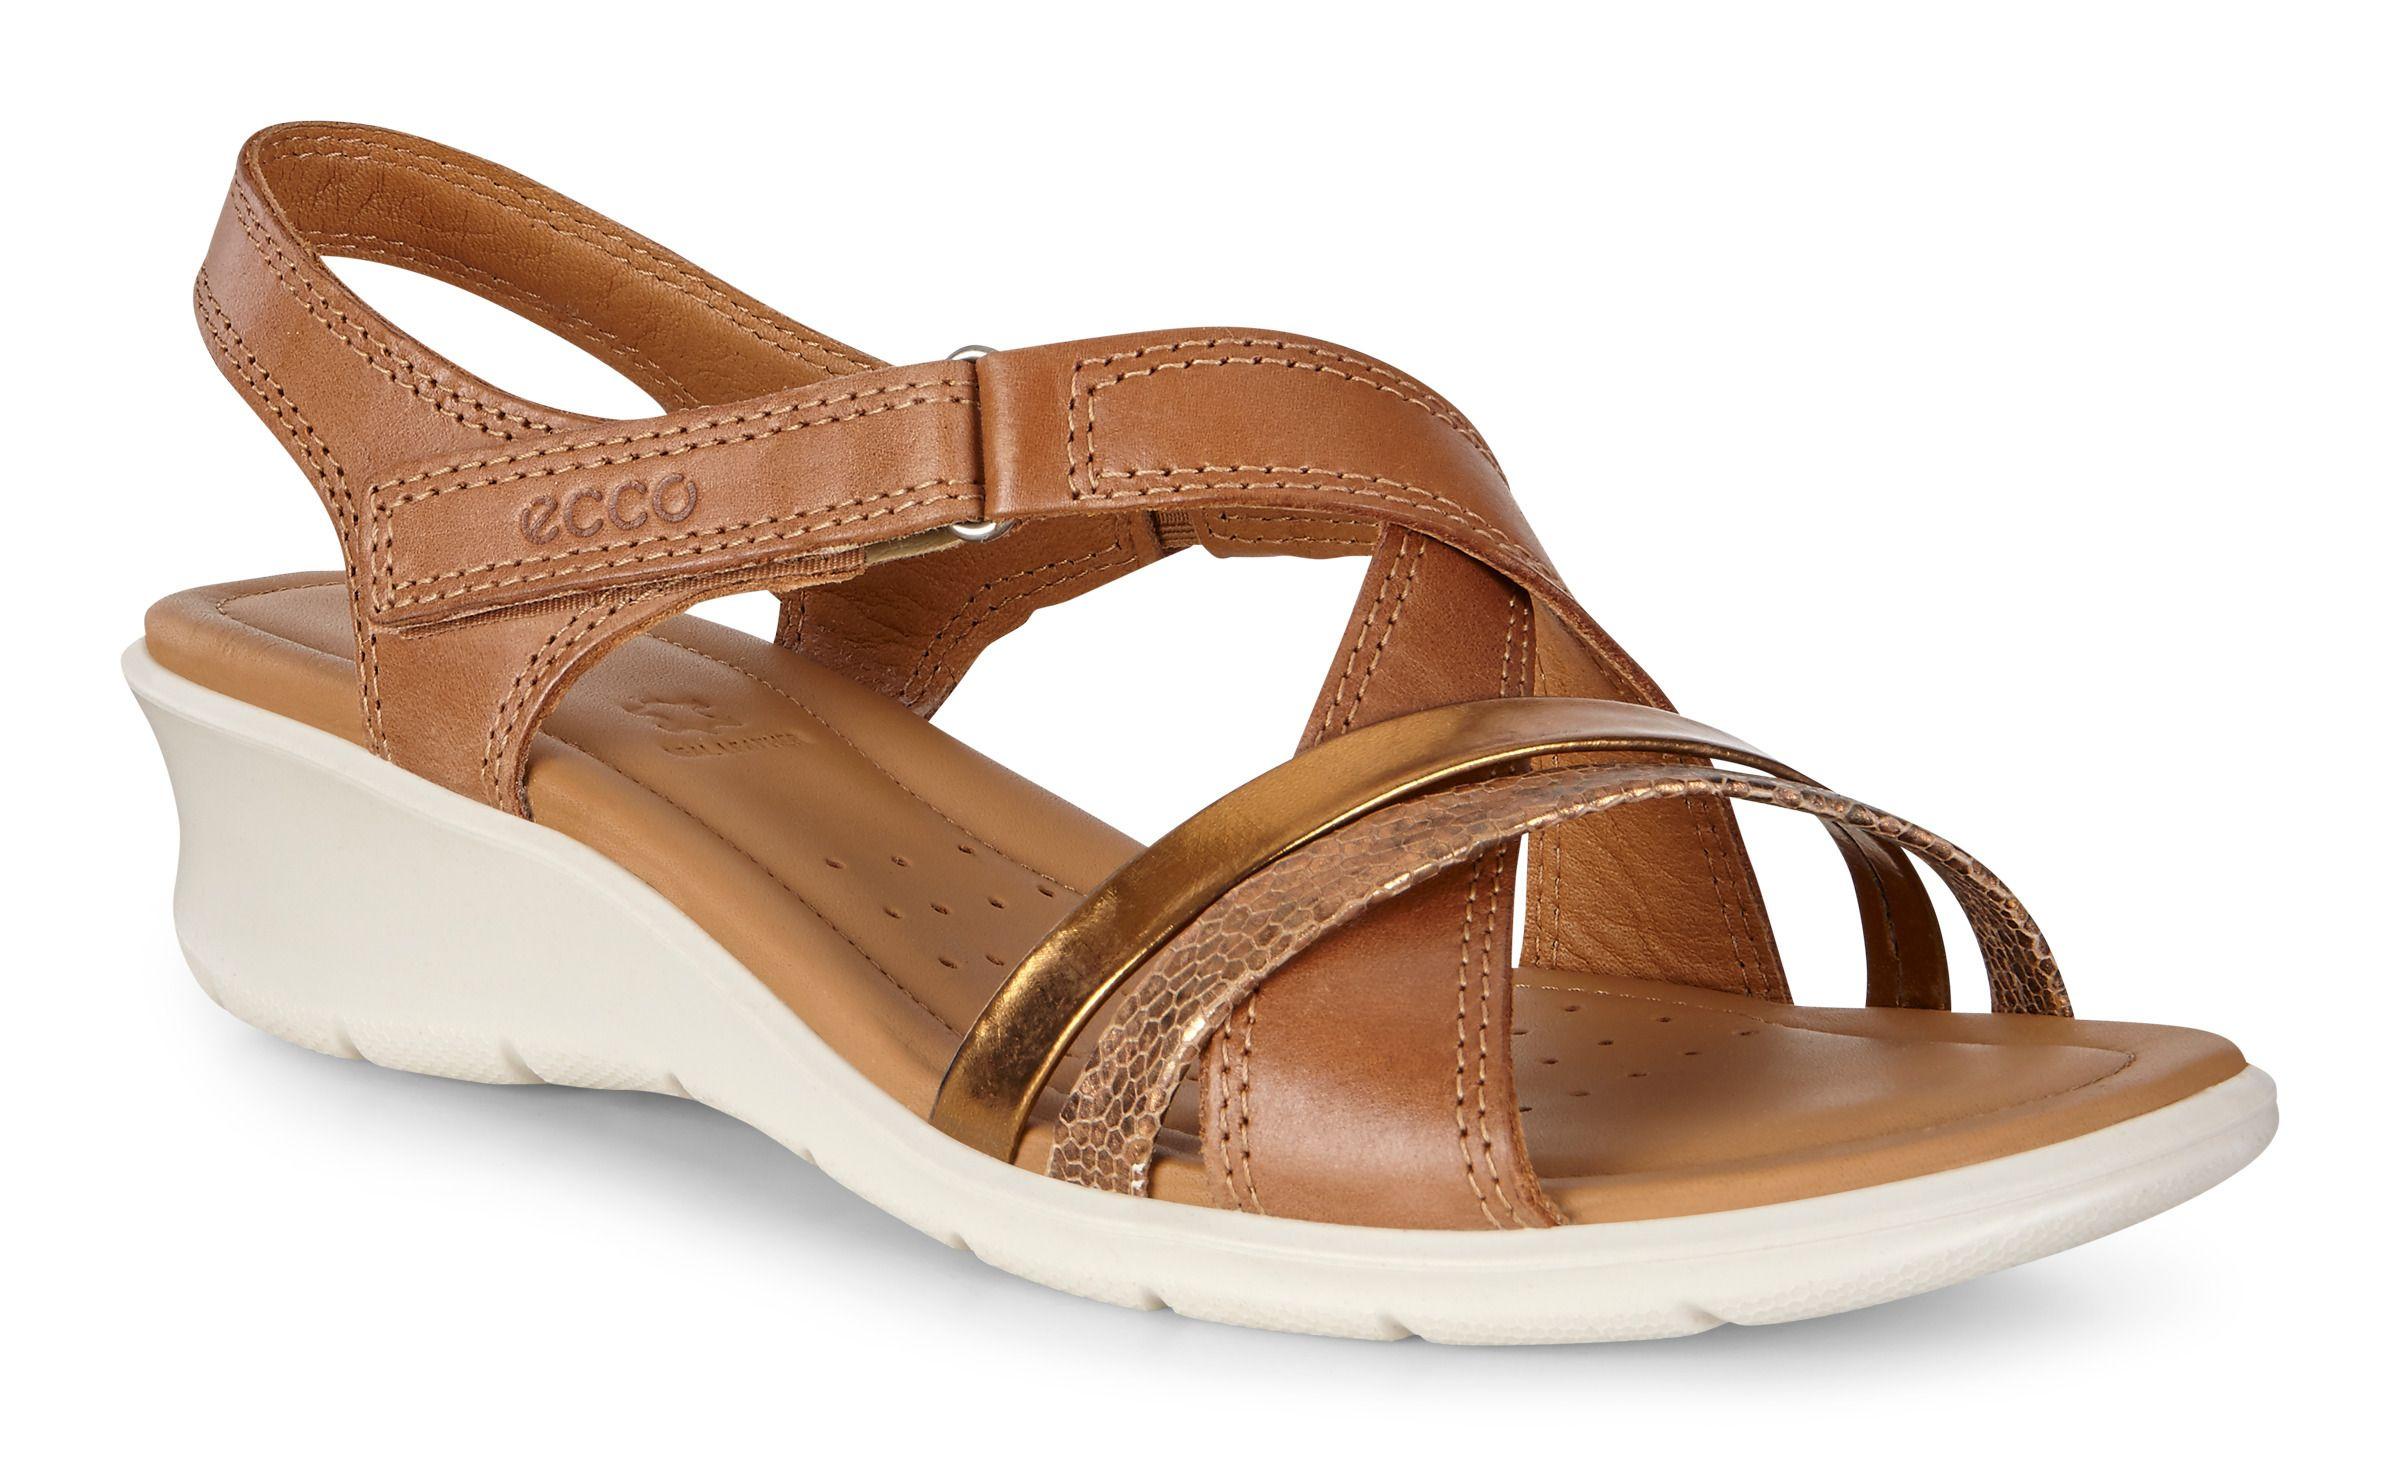 ECCO FELICIA SANDAL heeled